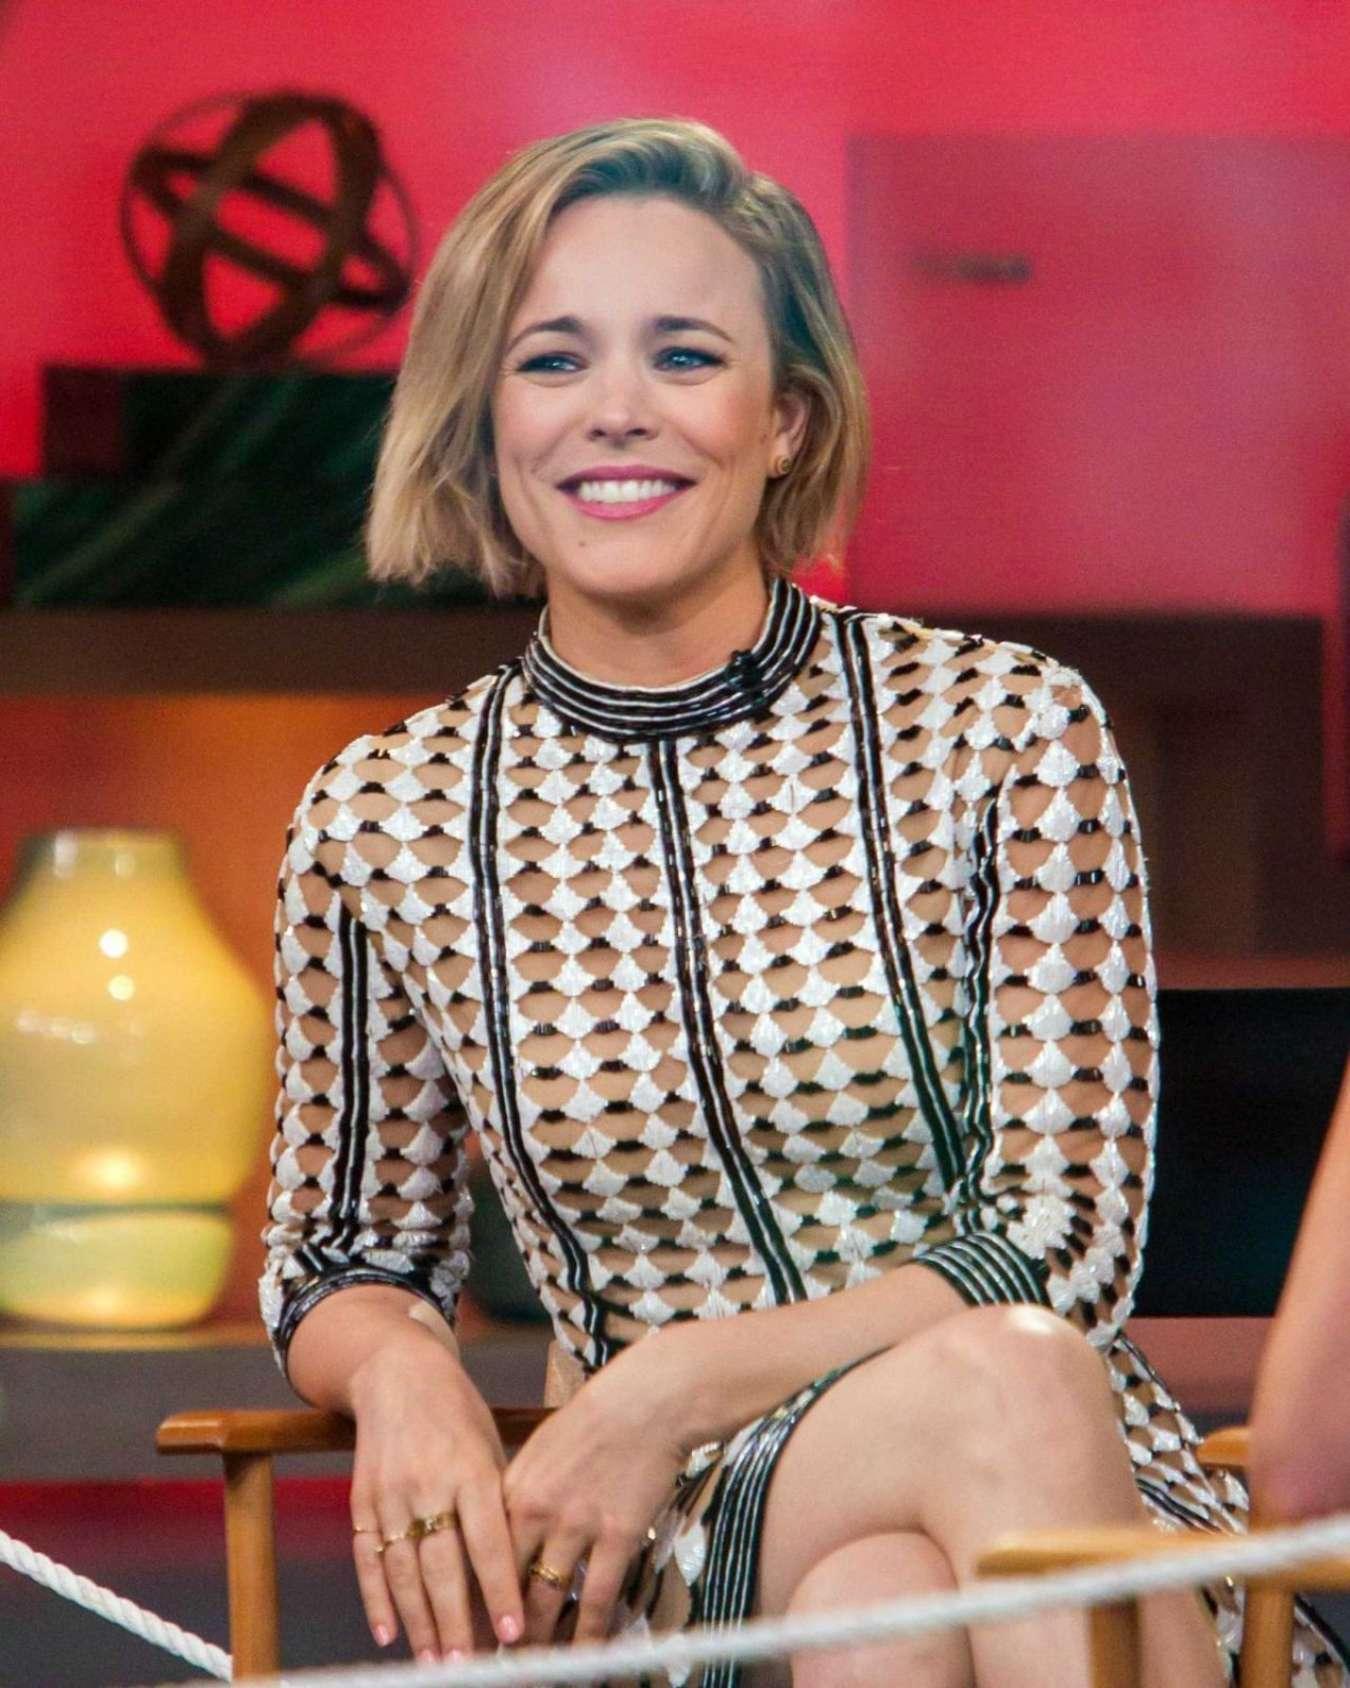 Rachel McAdams 2015 : Rachel McAdams: Good Morning America -02